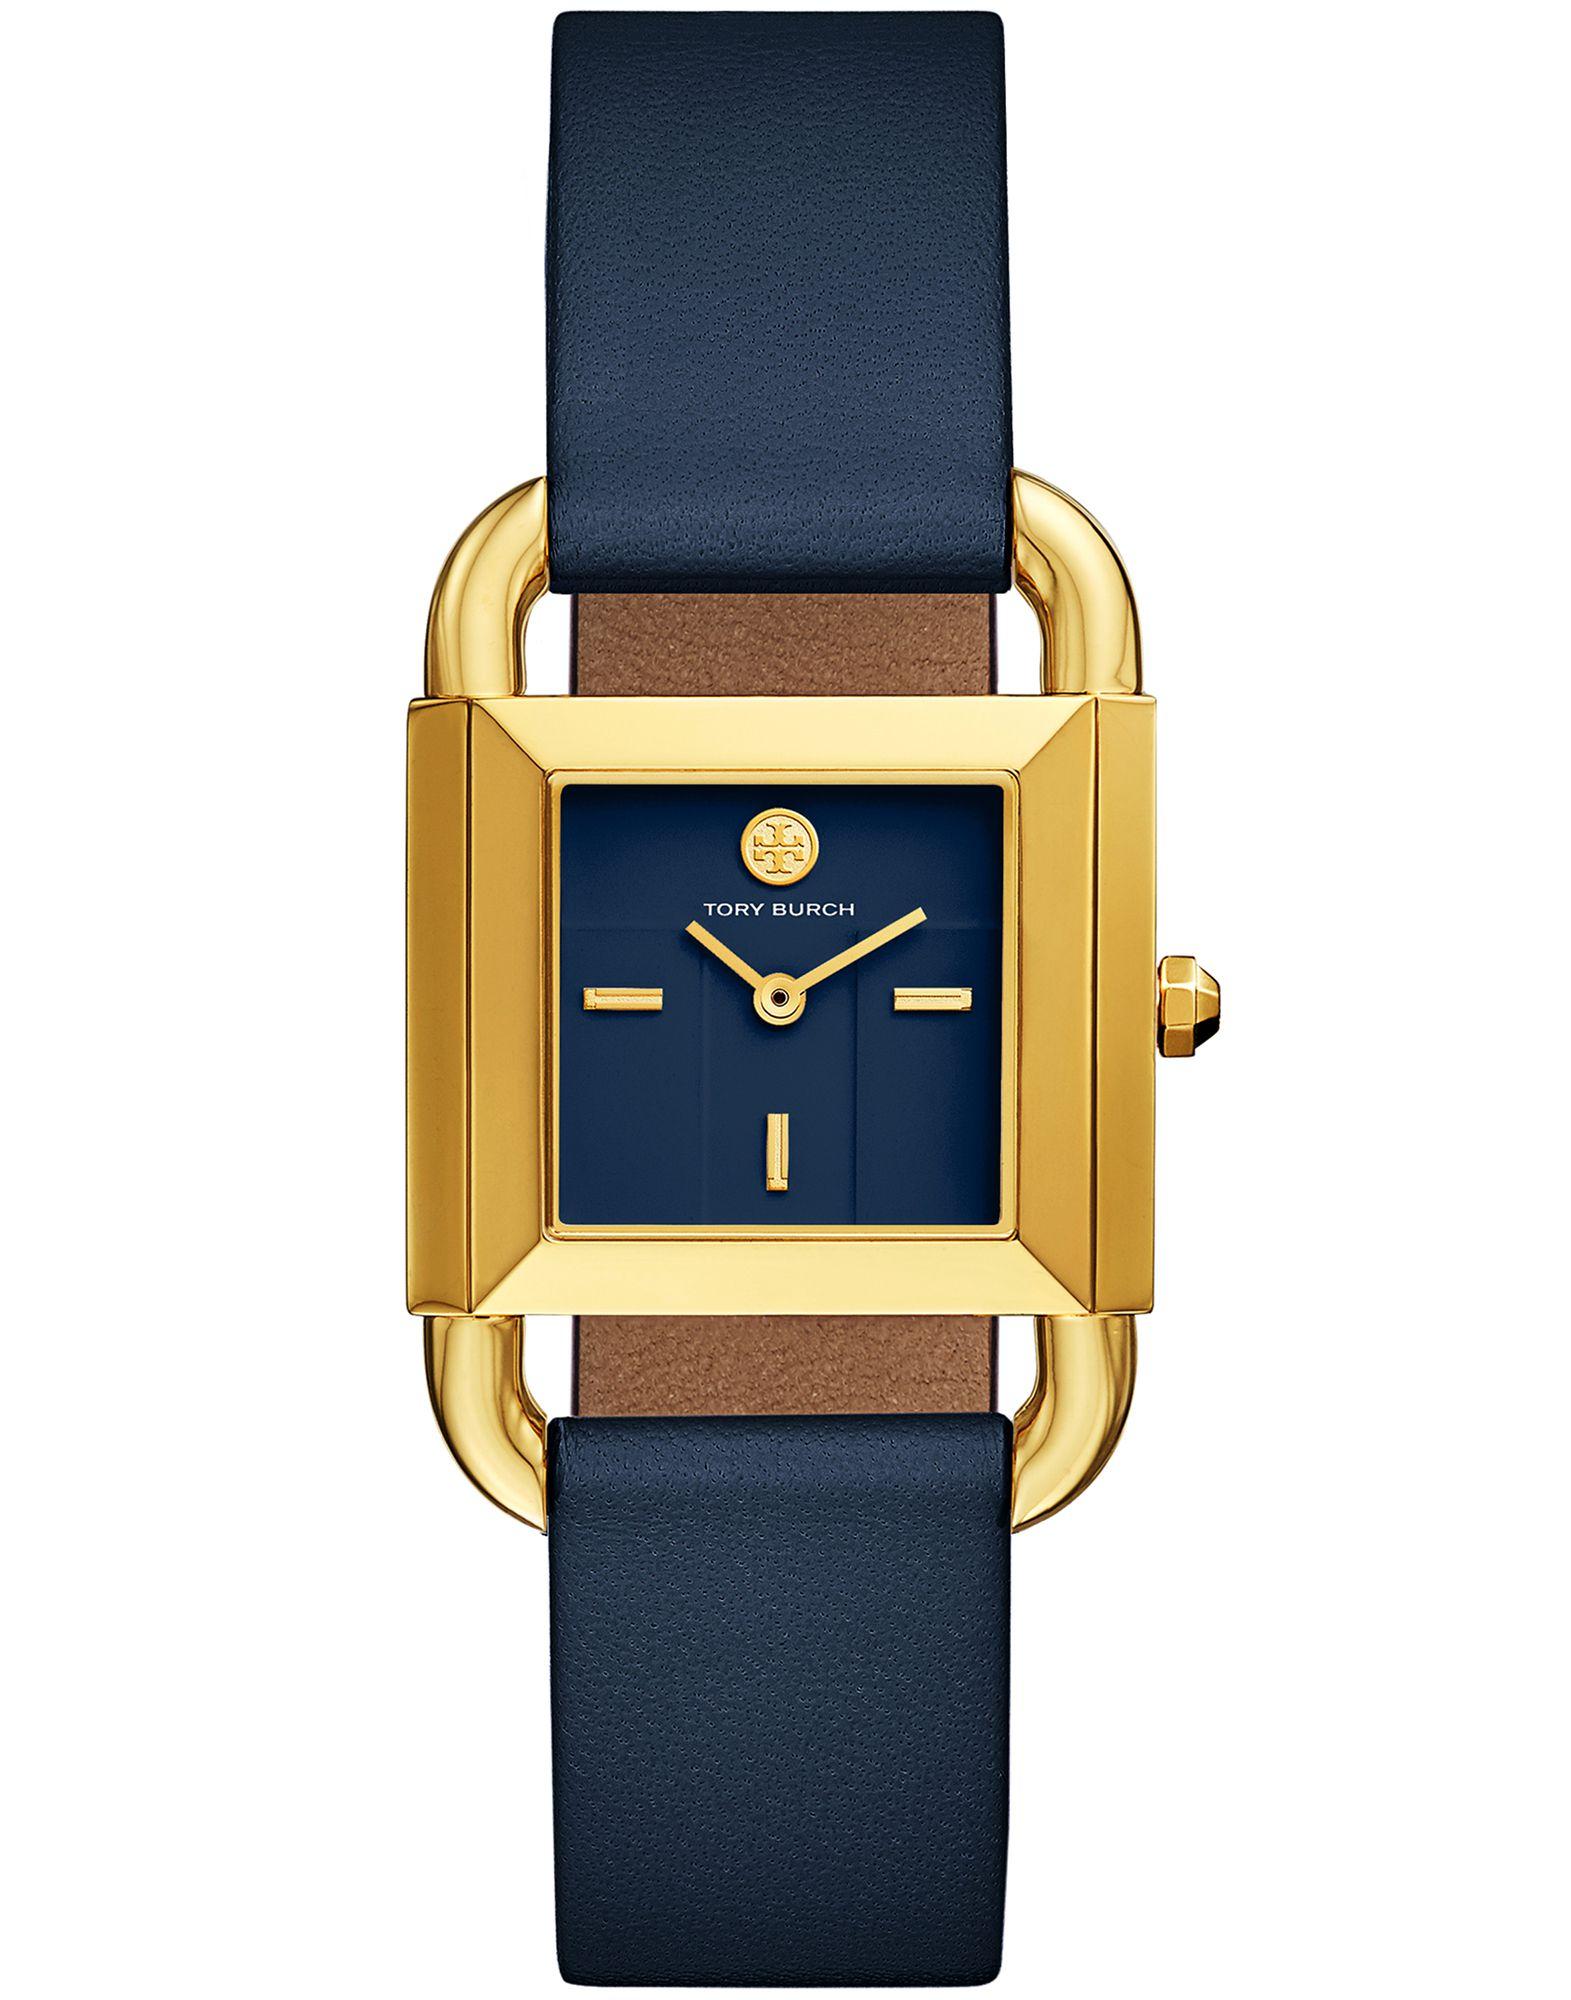 TORY BURCH Wrist watches - Item 58048492